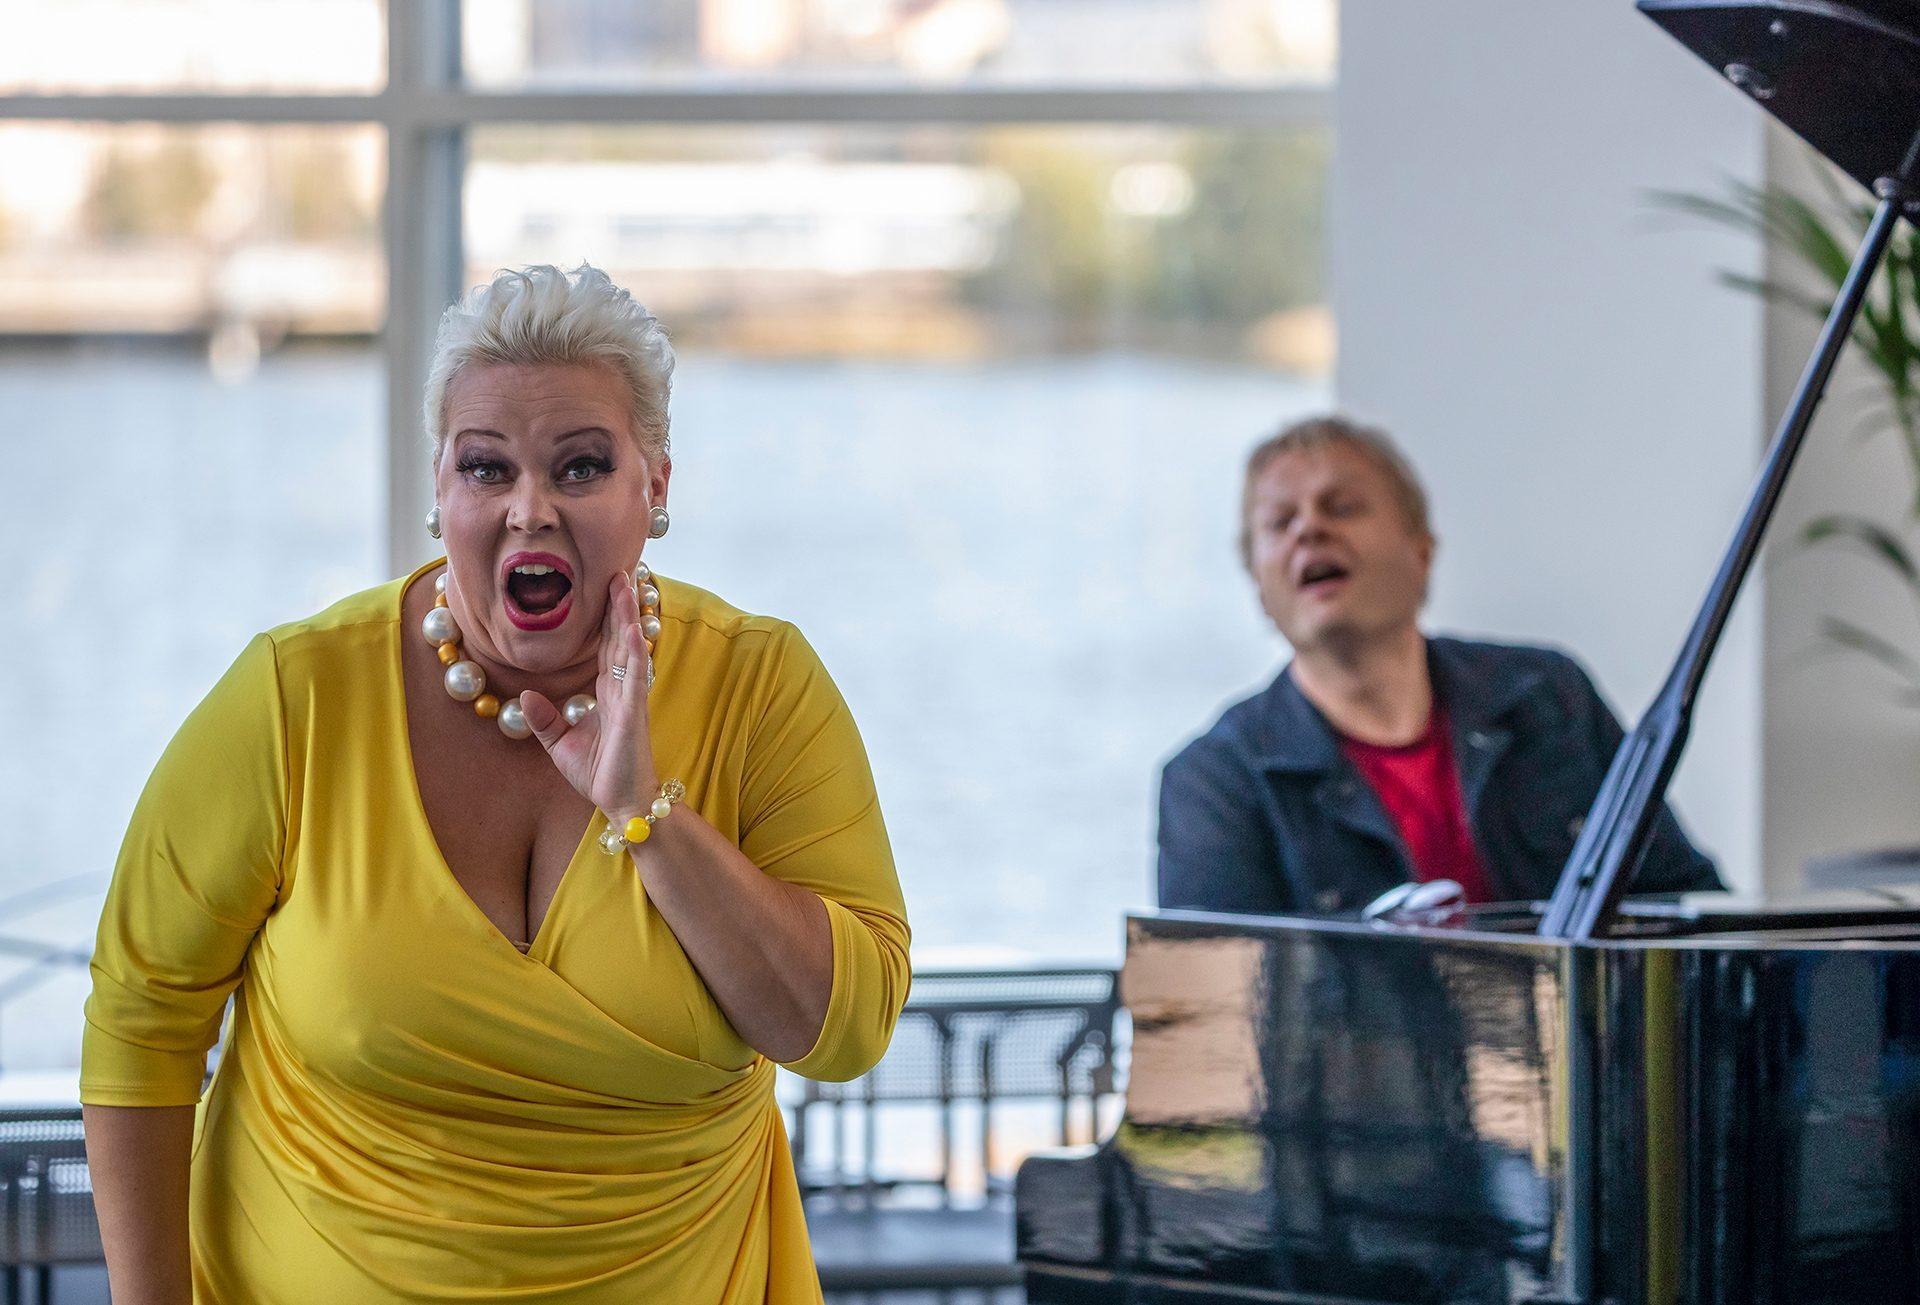 Johanna Rusanen, opera singer and Iiro Rantala, composer, Helsinki